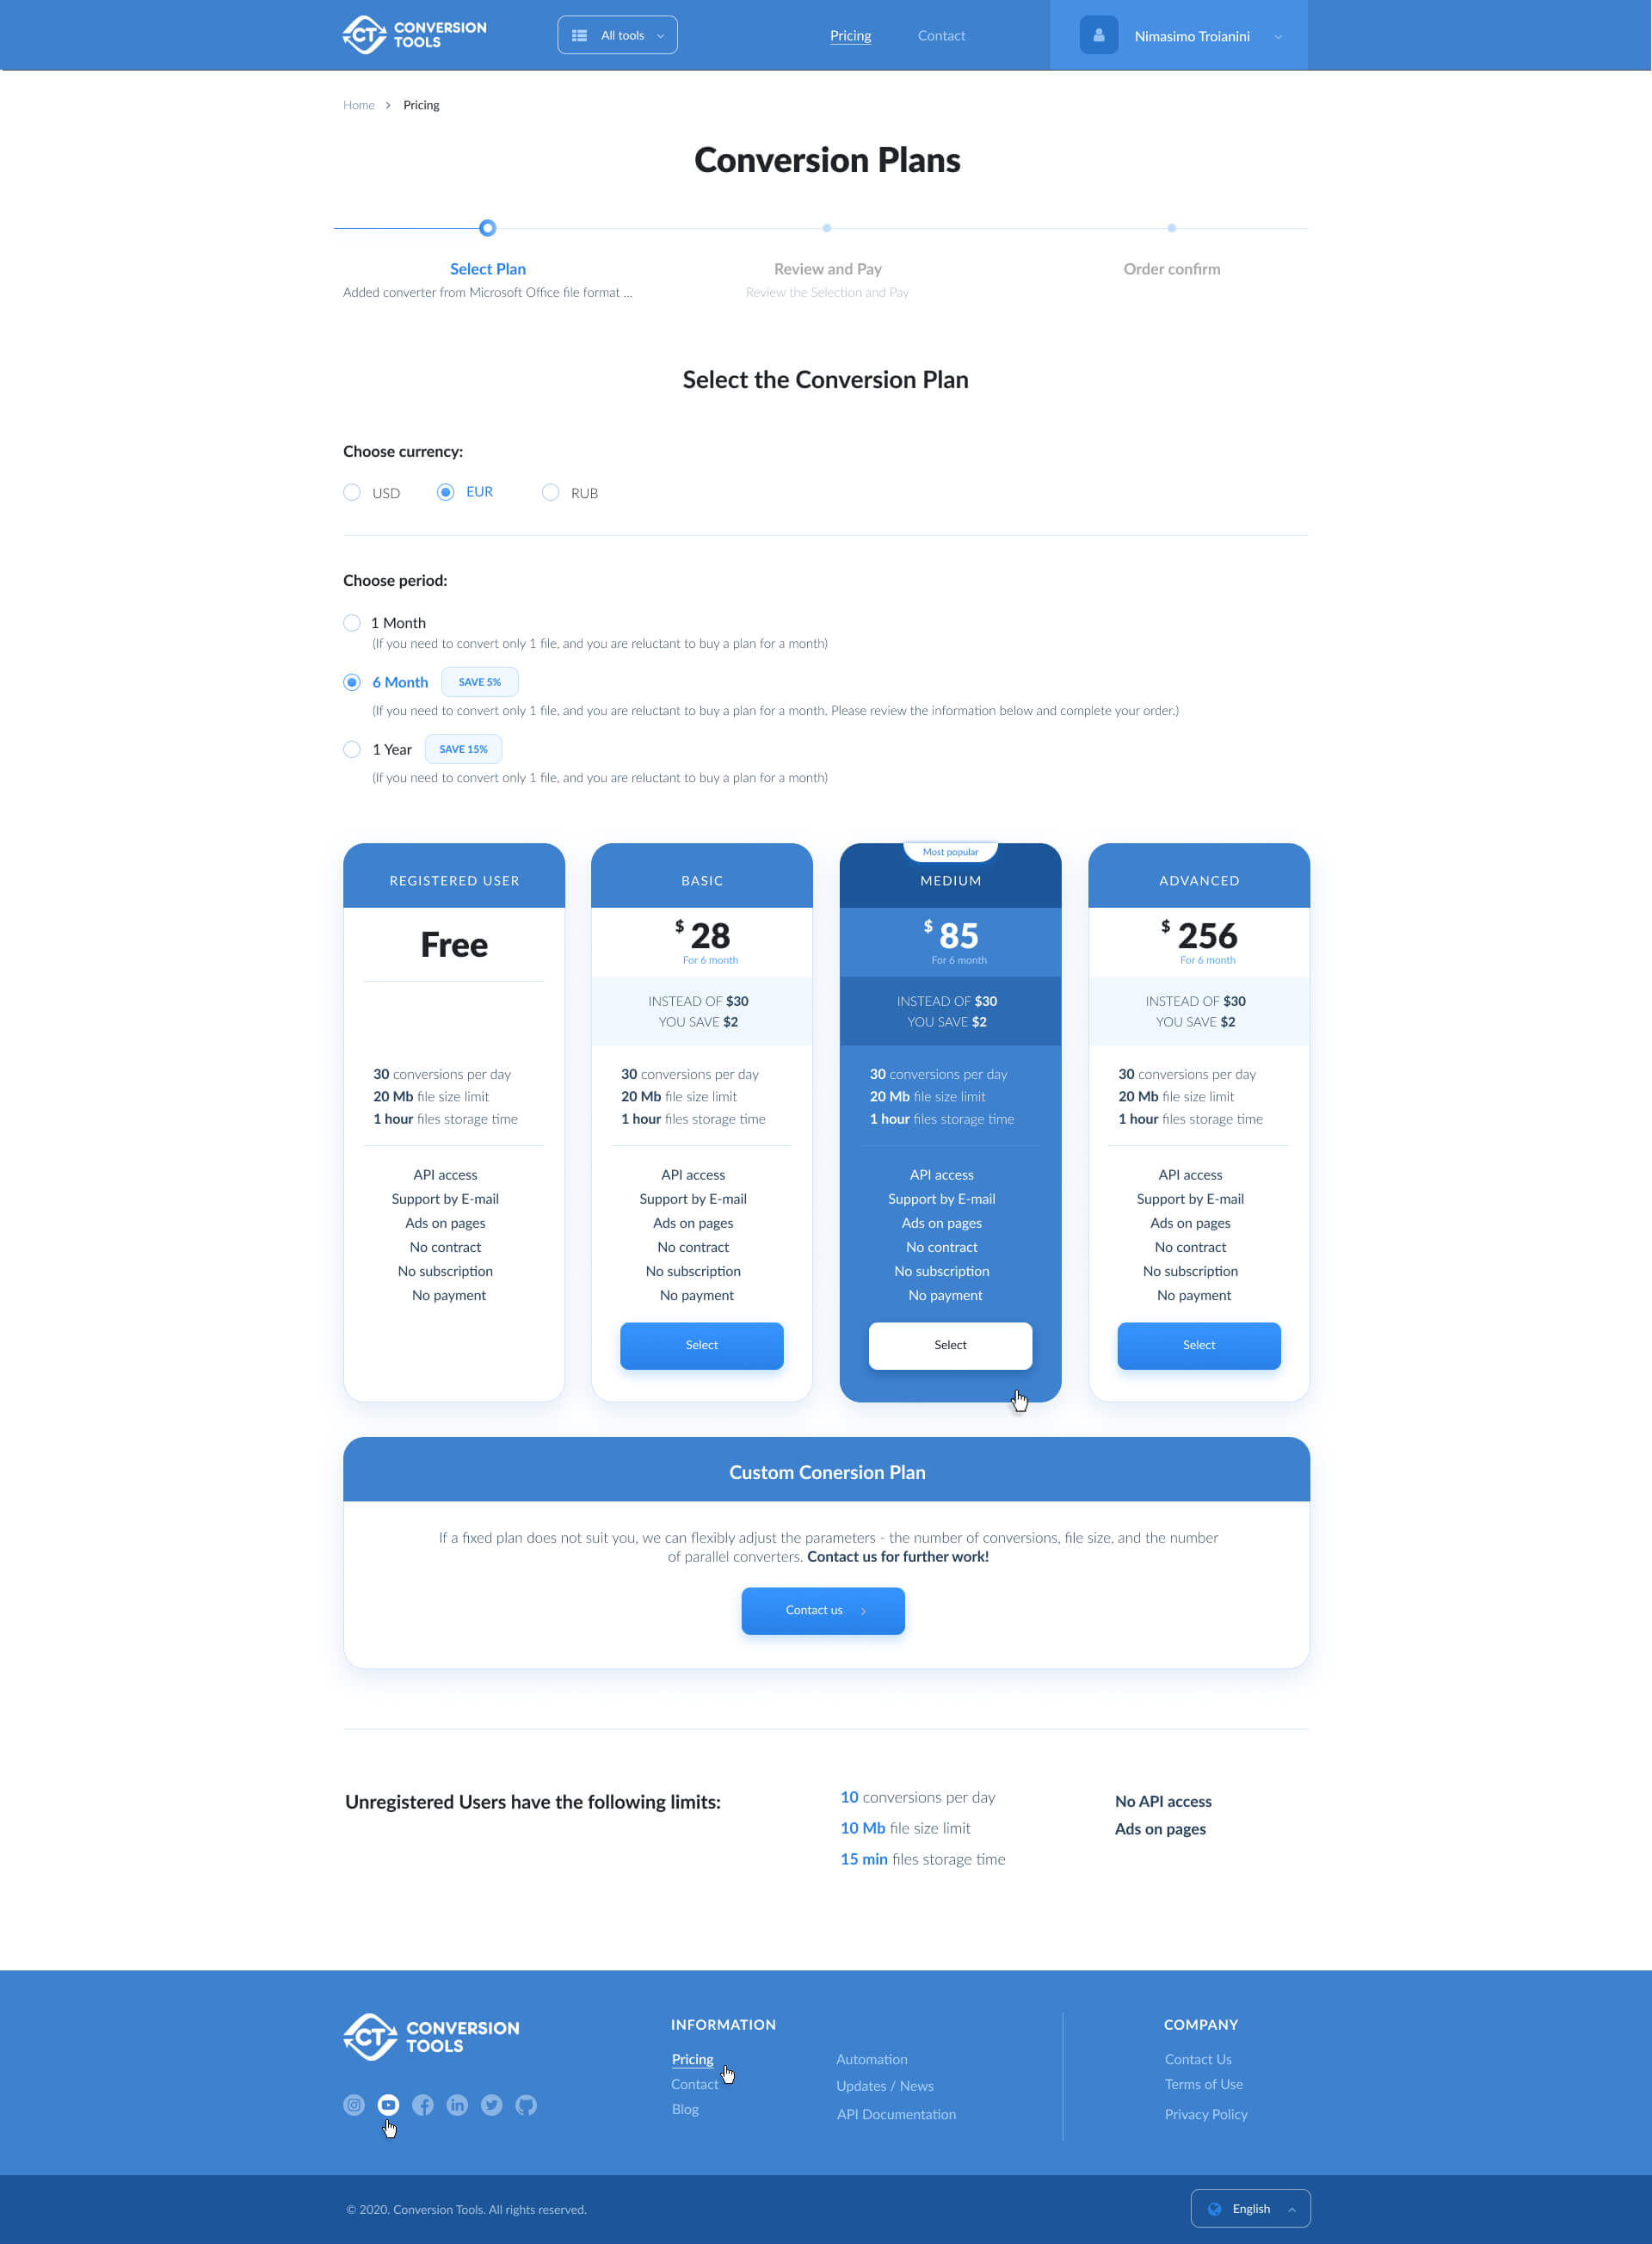 08_Сonversiontools.io_Design_Pricing_1.0